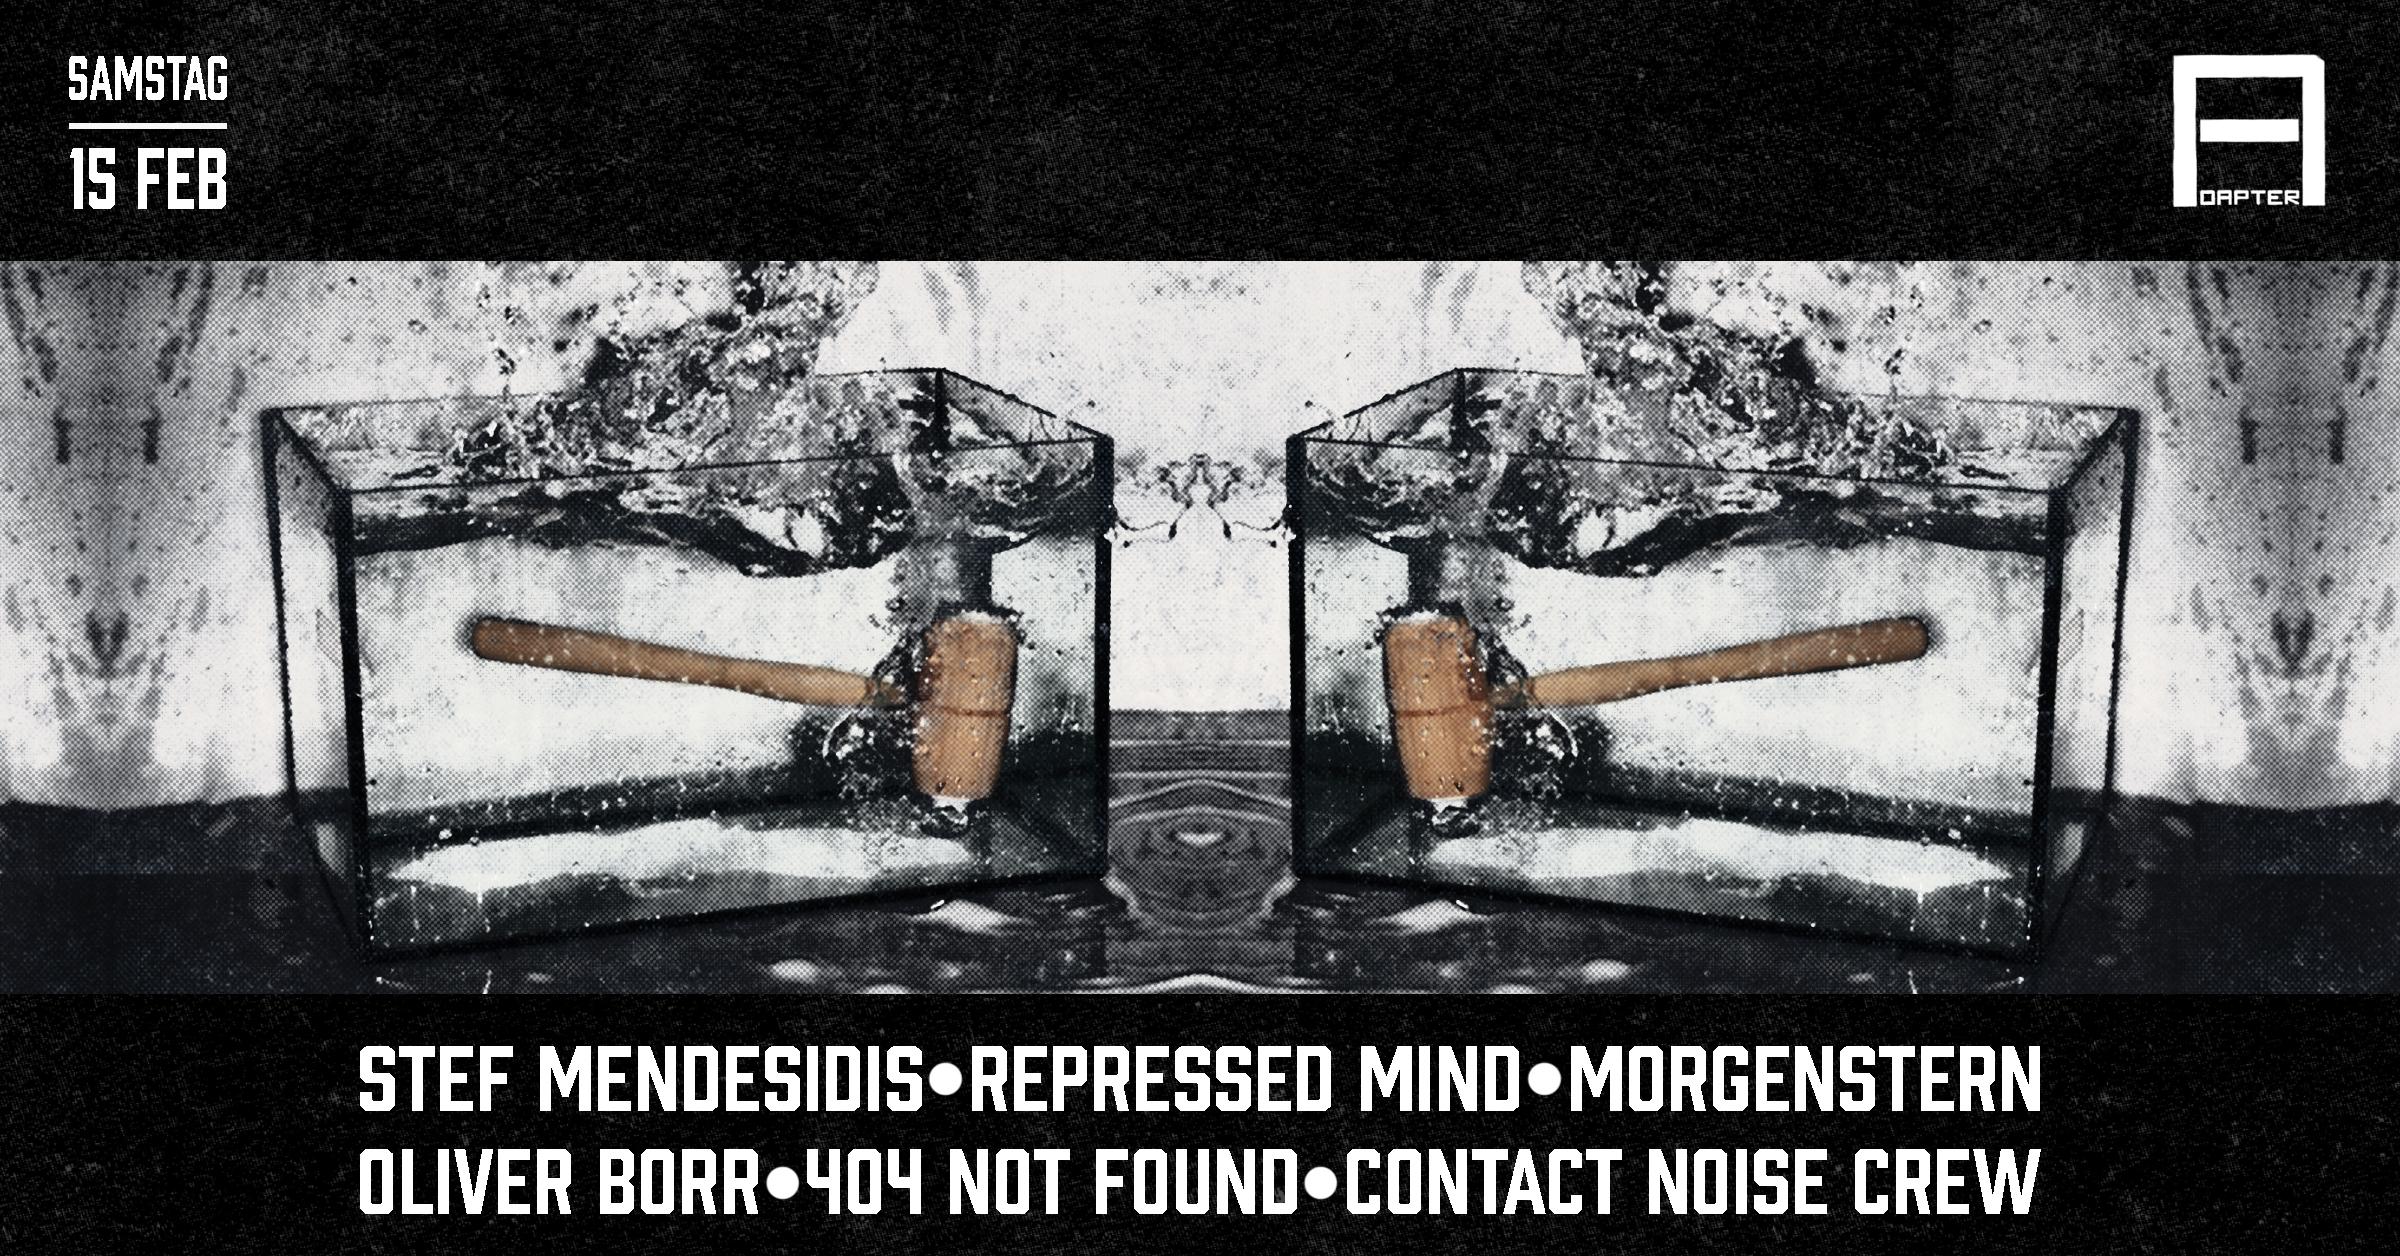 Adapter w/ Stef Mendesidis & Repressed Mind